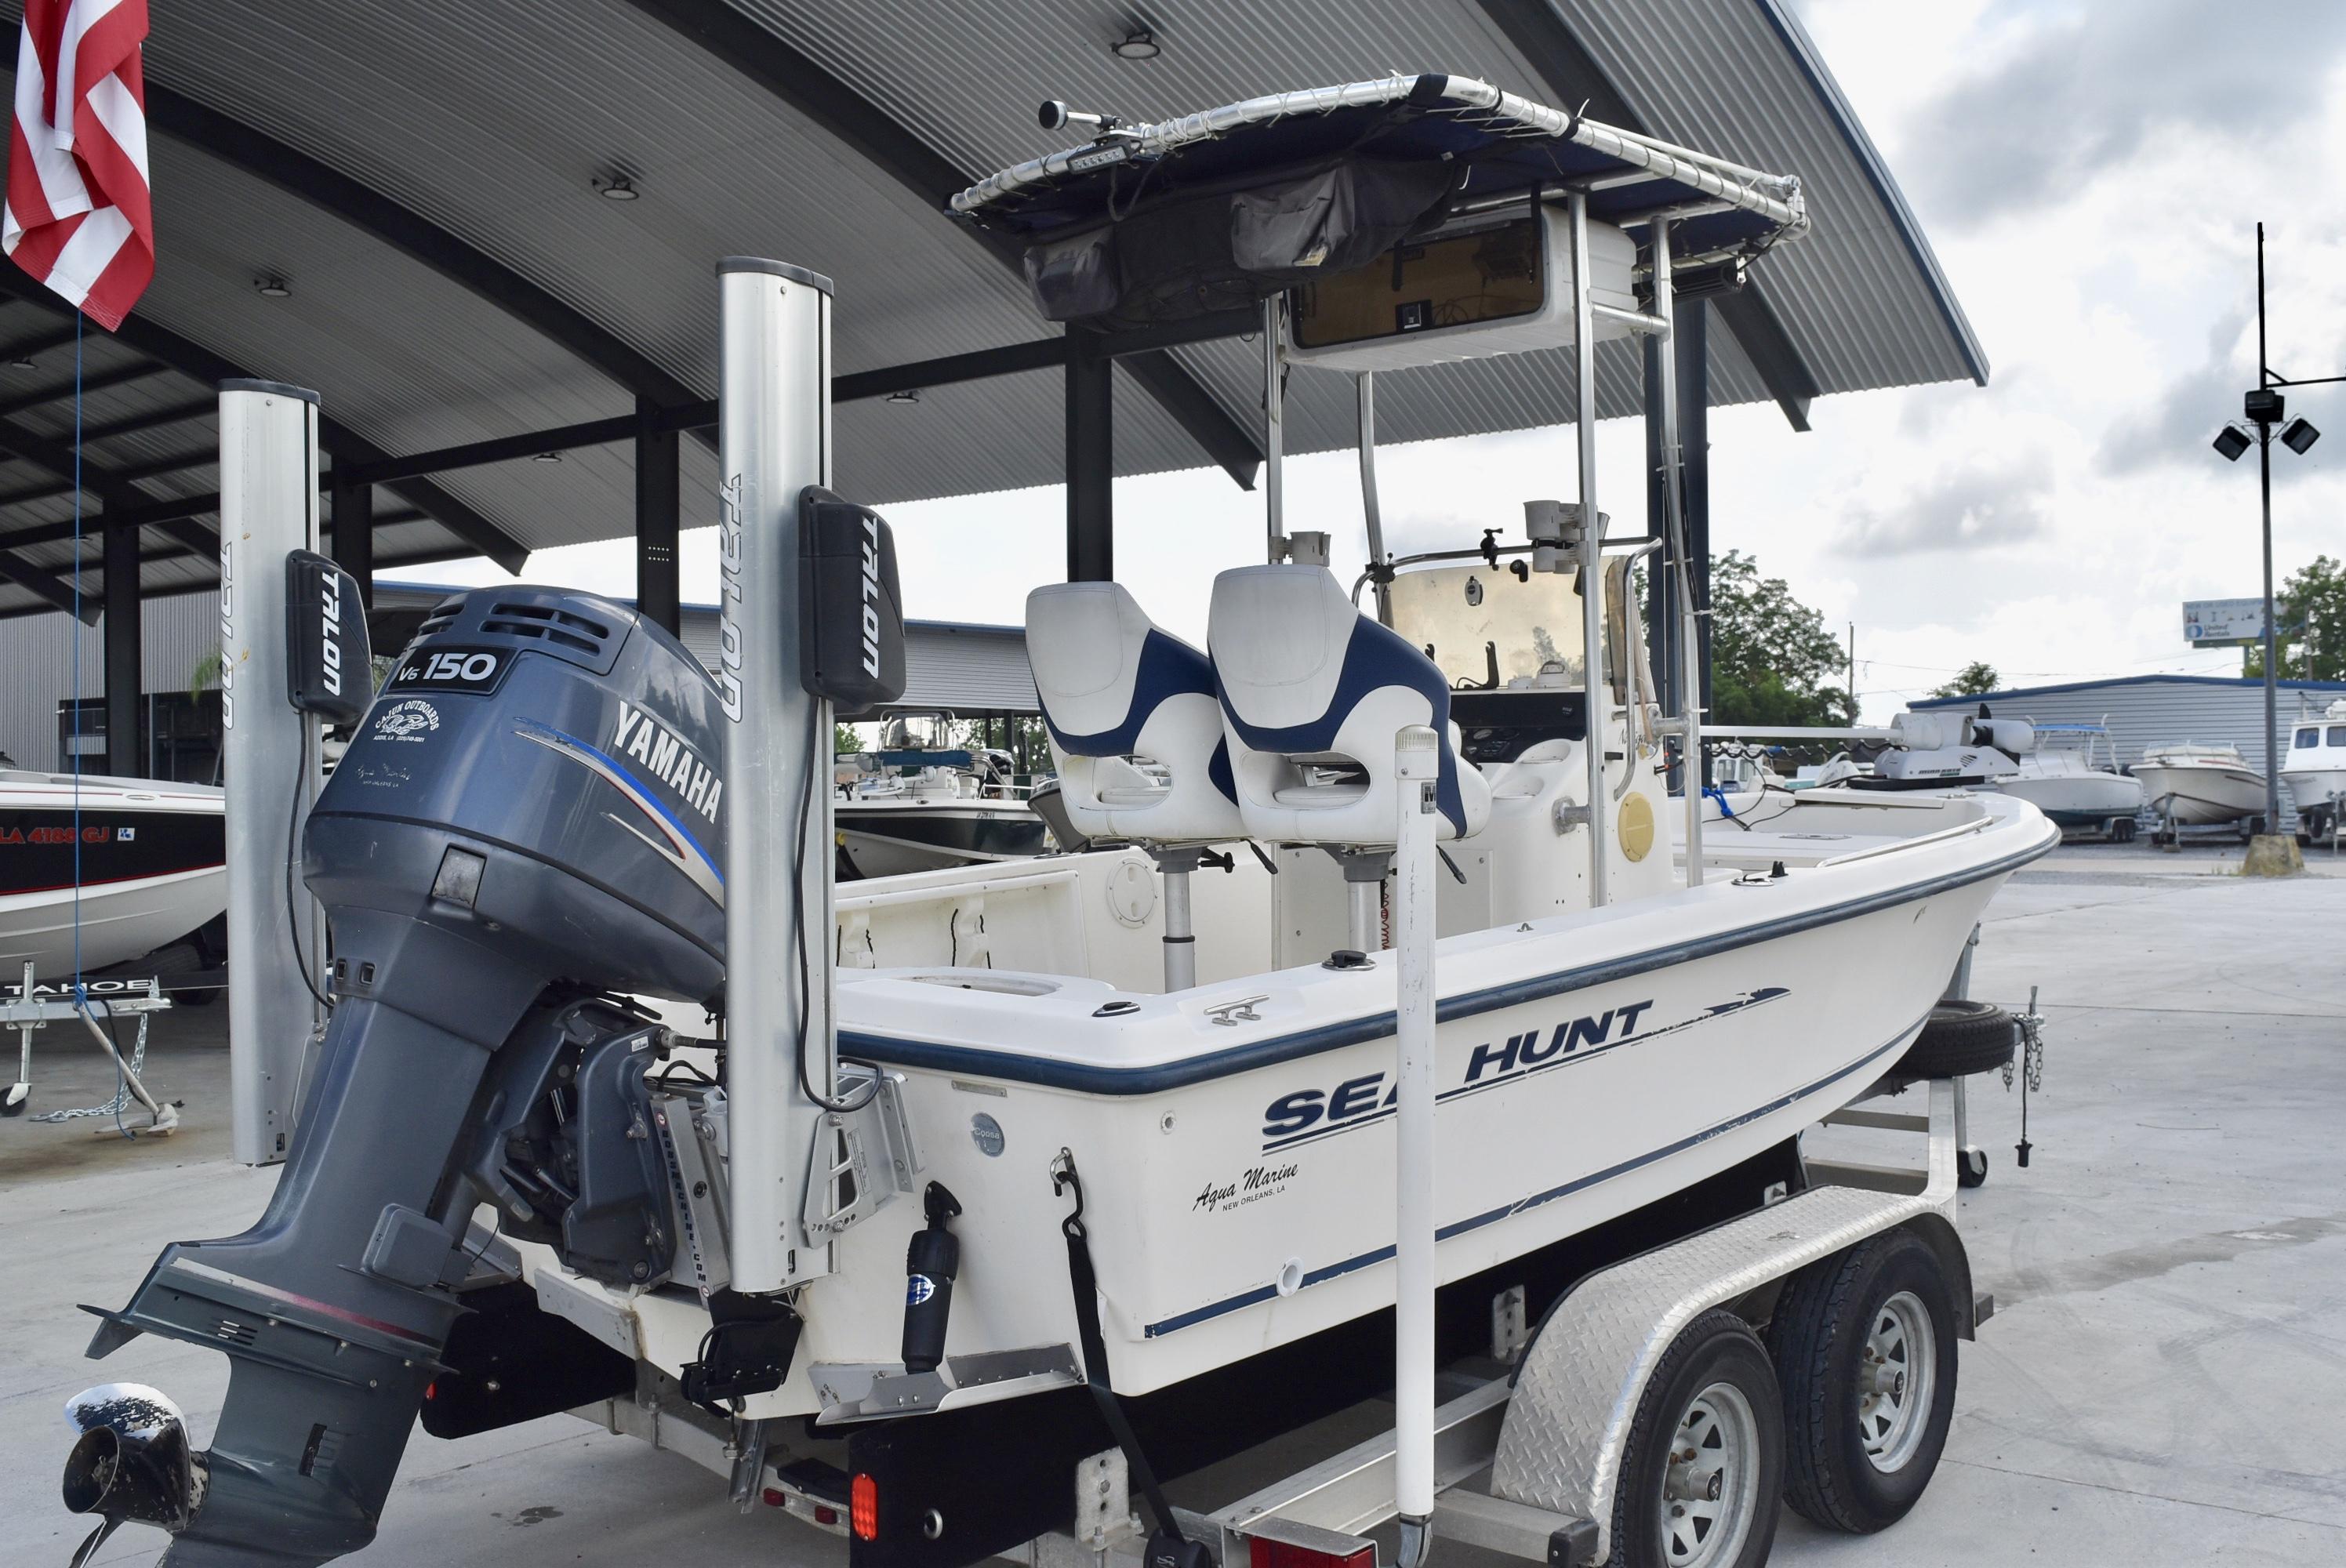 2002 Sea Hunt boat for sale, model of the boat is Navigator 20 & Image # 5 of 7